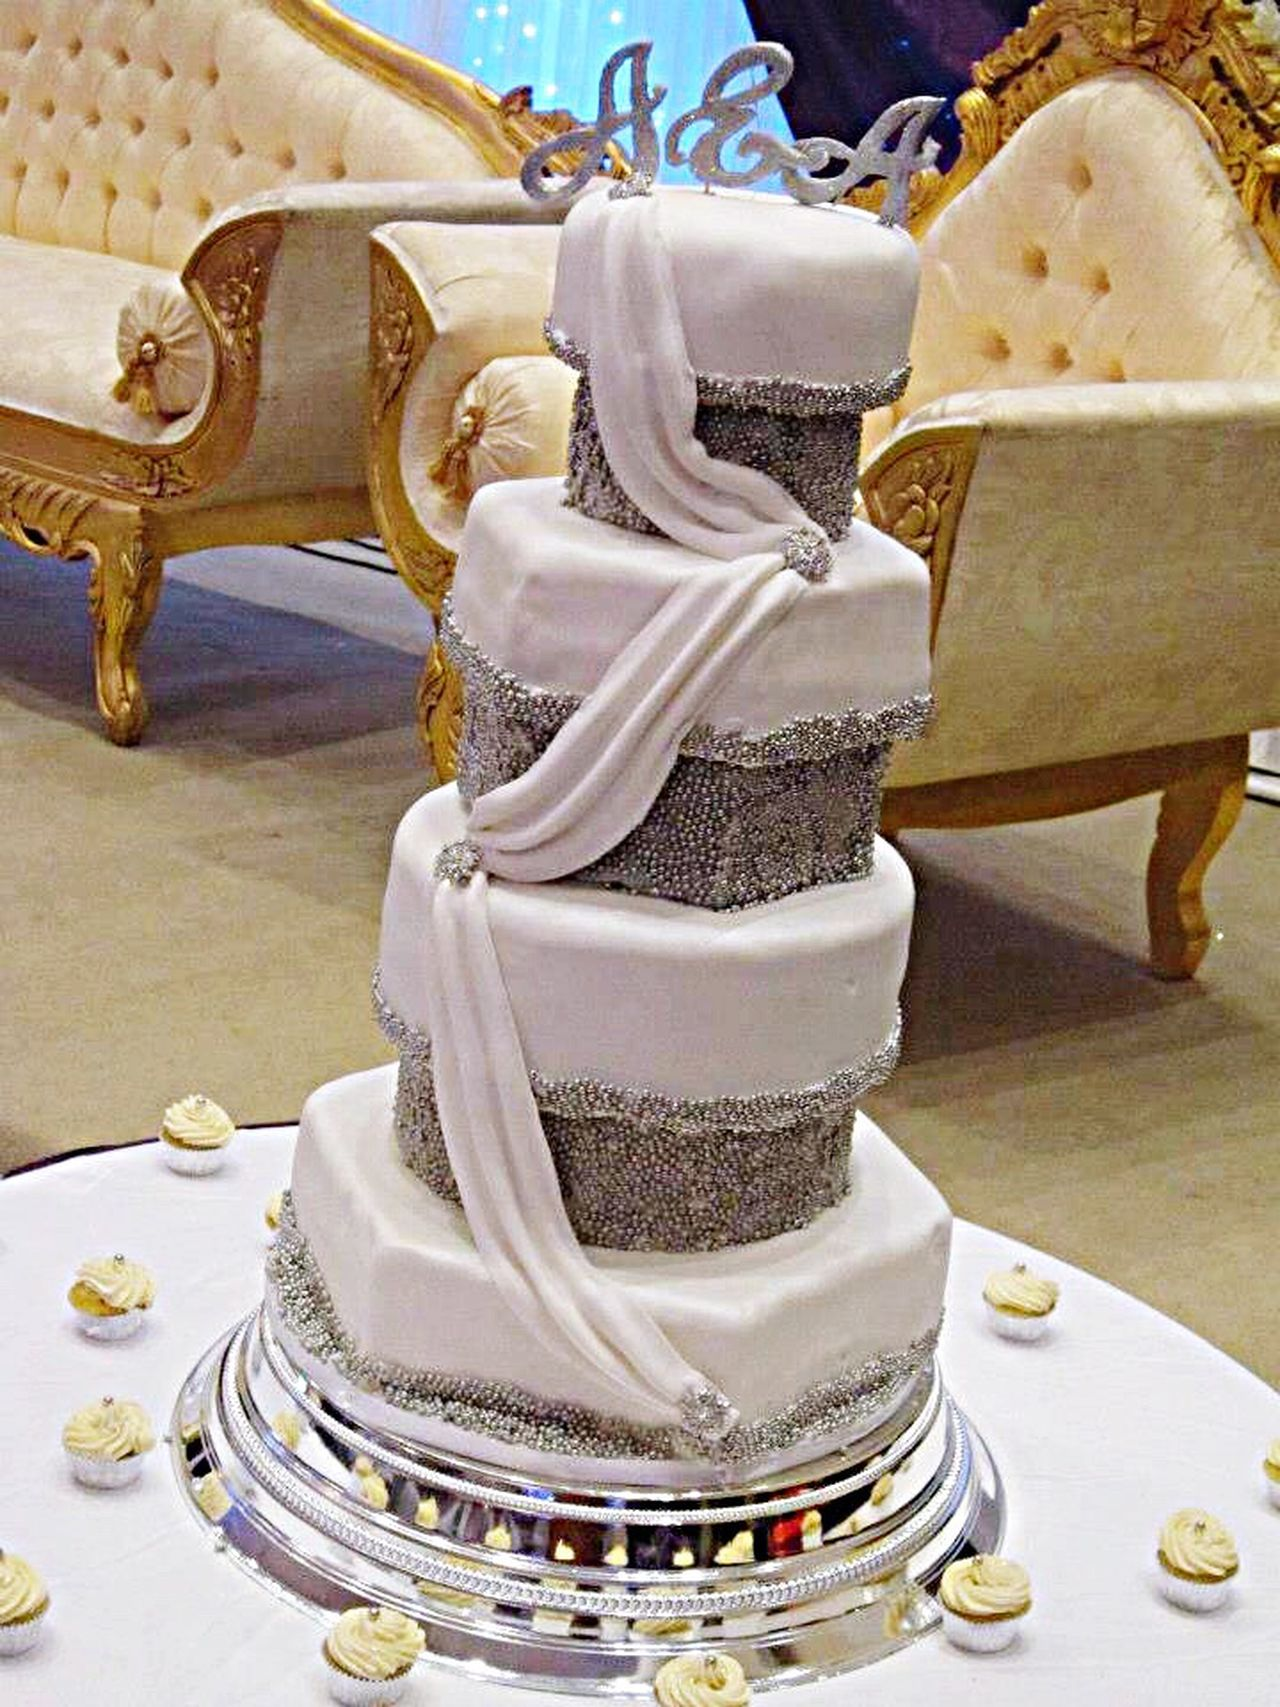 Cake Foodphotography Food London Wedding Cake